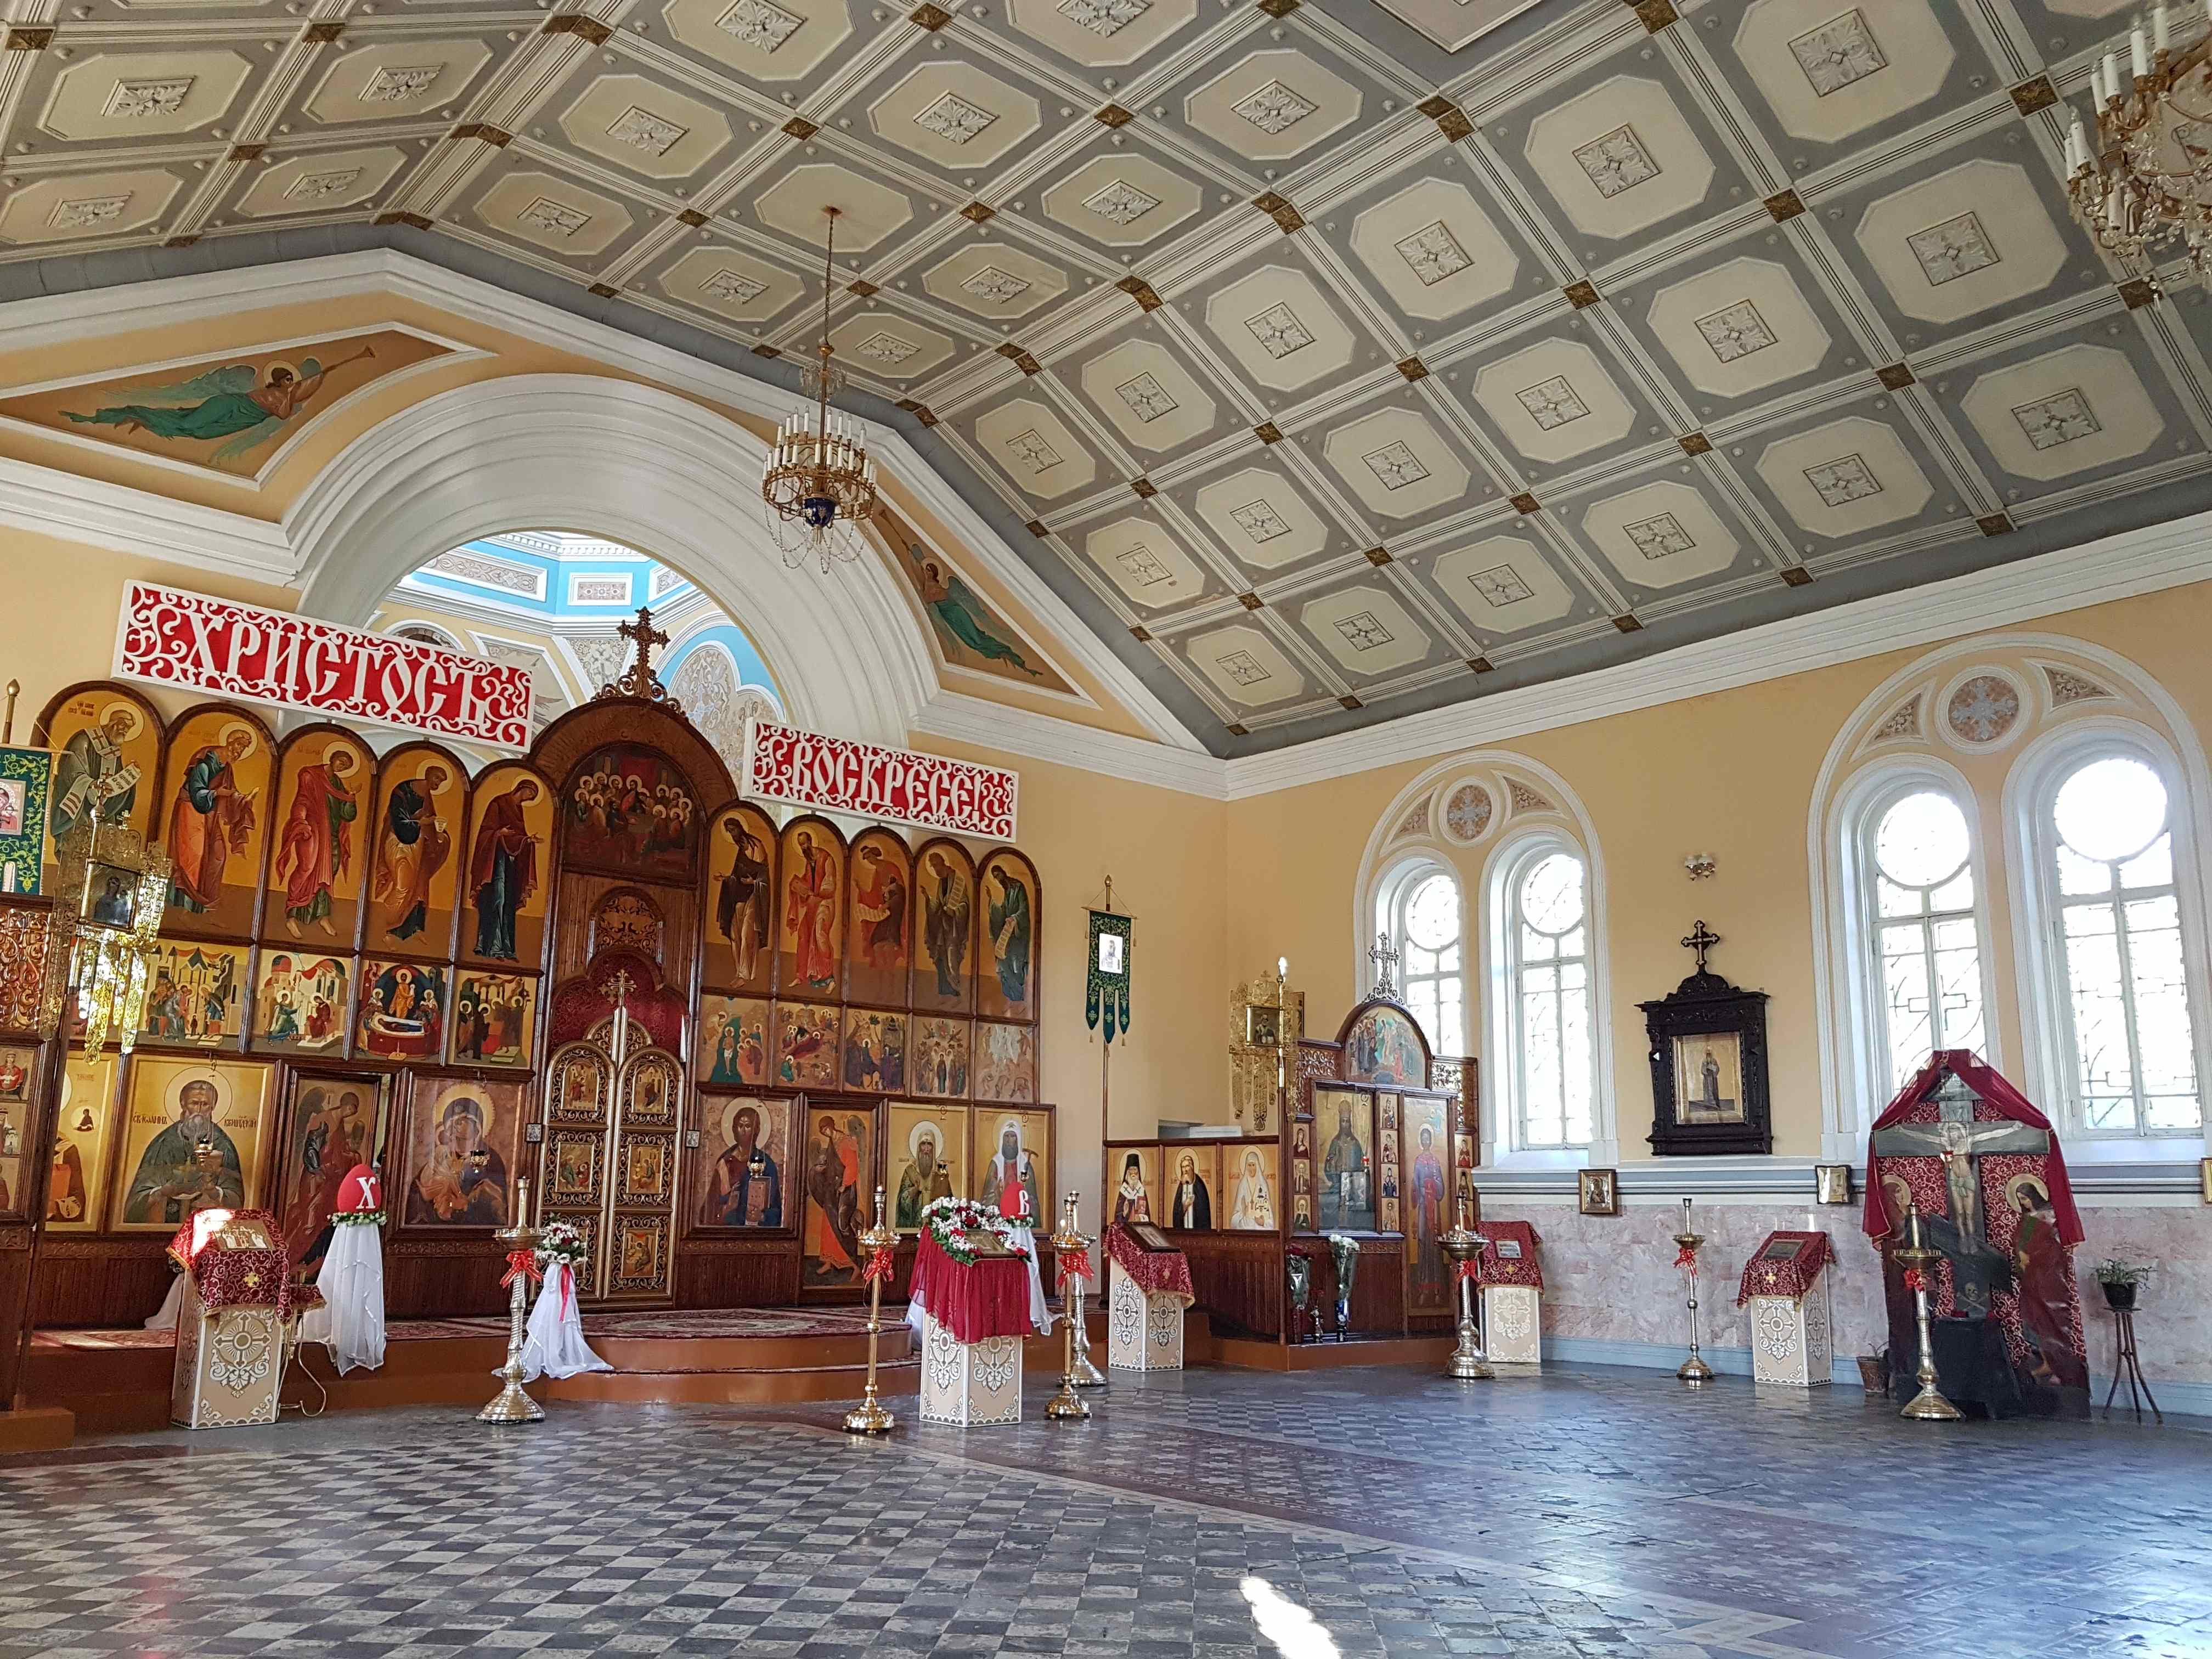 Cathédrale Saint-Alexis Samarcande Ouzbékistan Eglise orthodoxe Intérieur